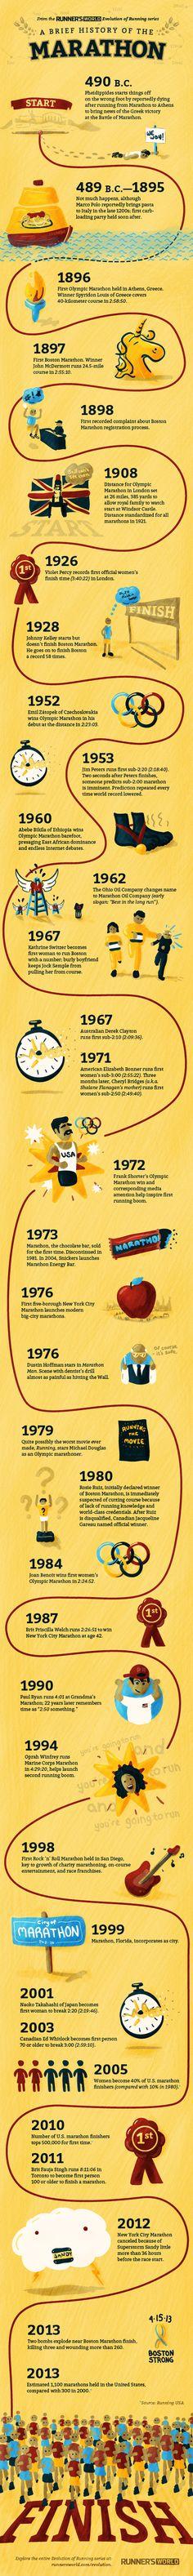 Infographic - Marathon evolution